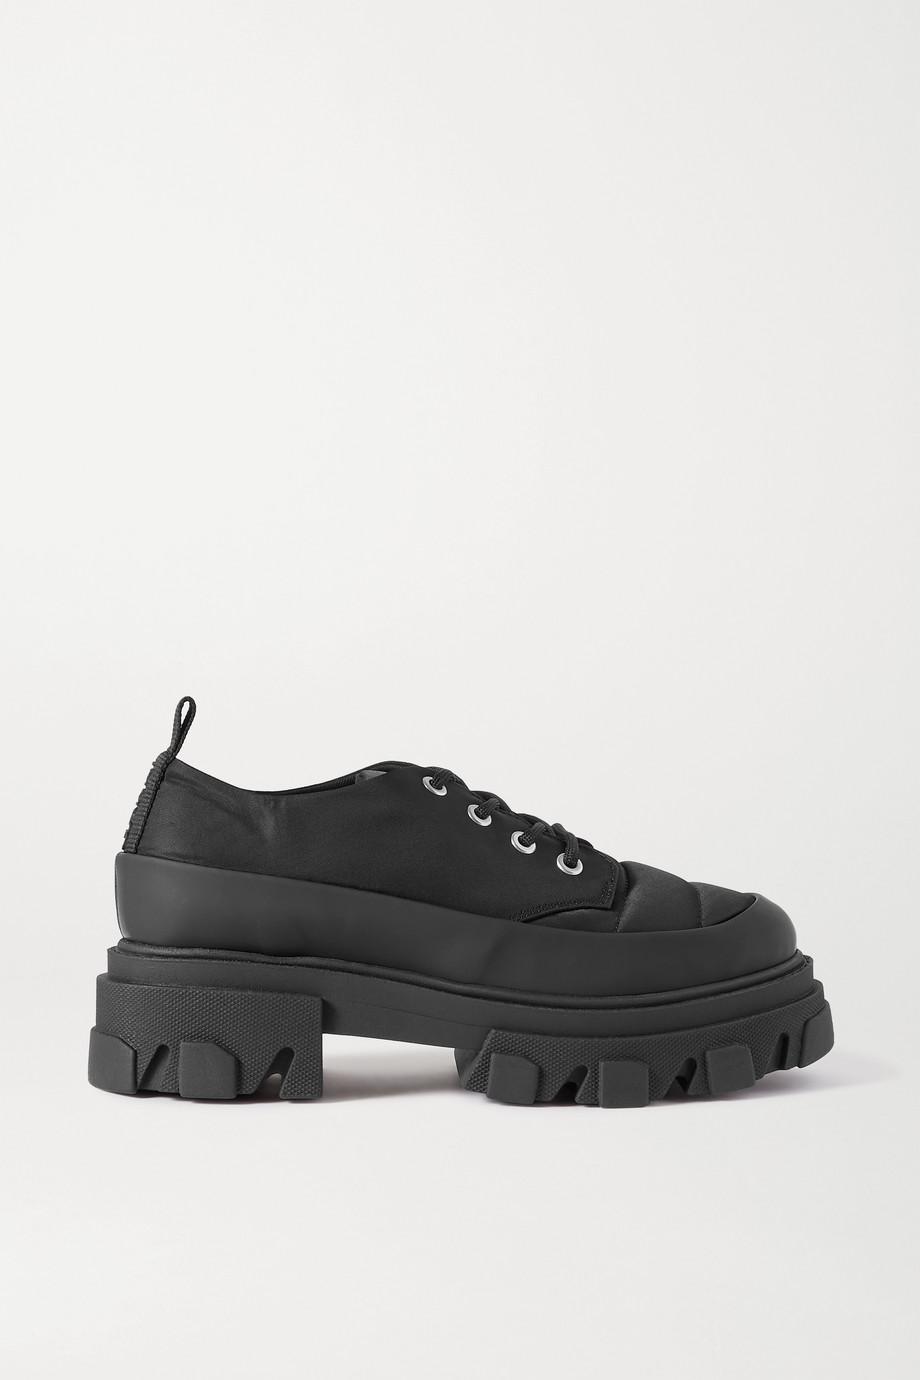 GANNI 软壳面料布洛克鞋